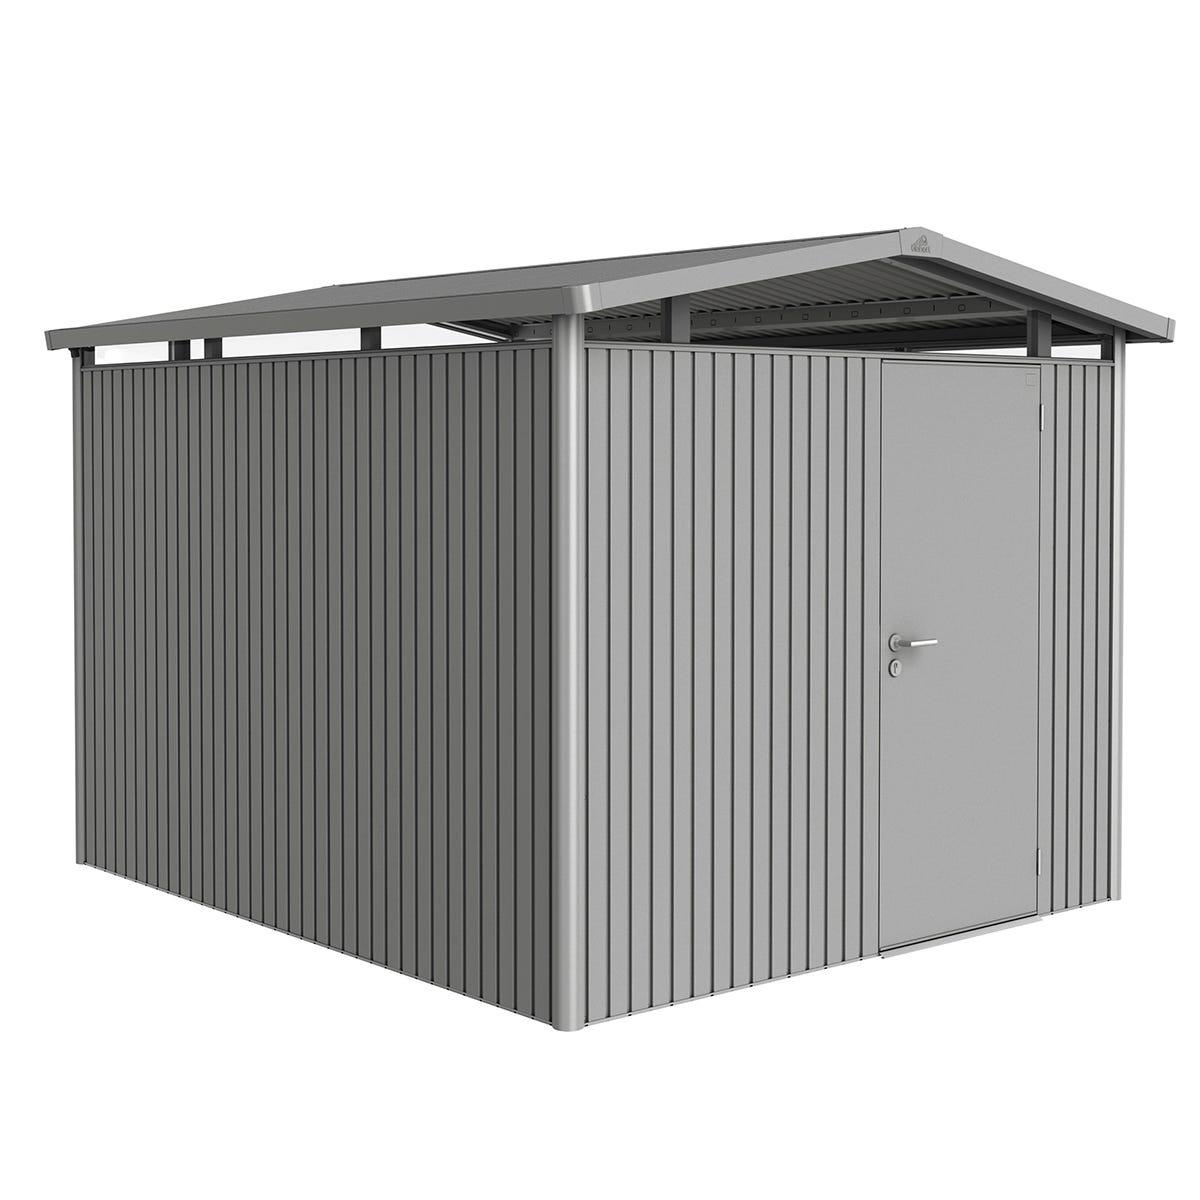 Biohort Panorama Metal Shed P5 Standard door 9' x 10' - Quartz Grey